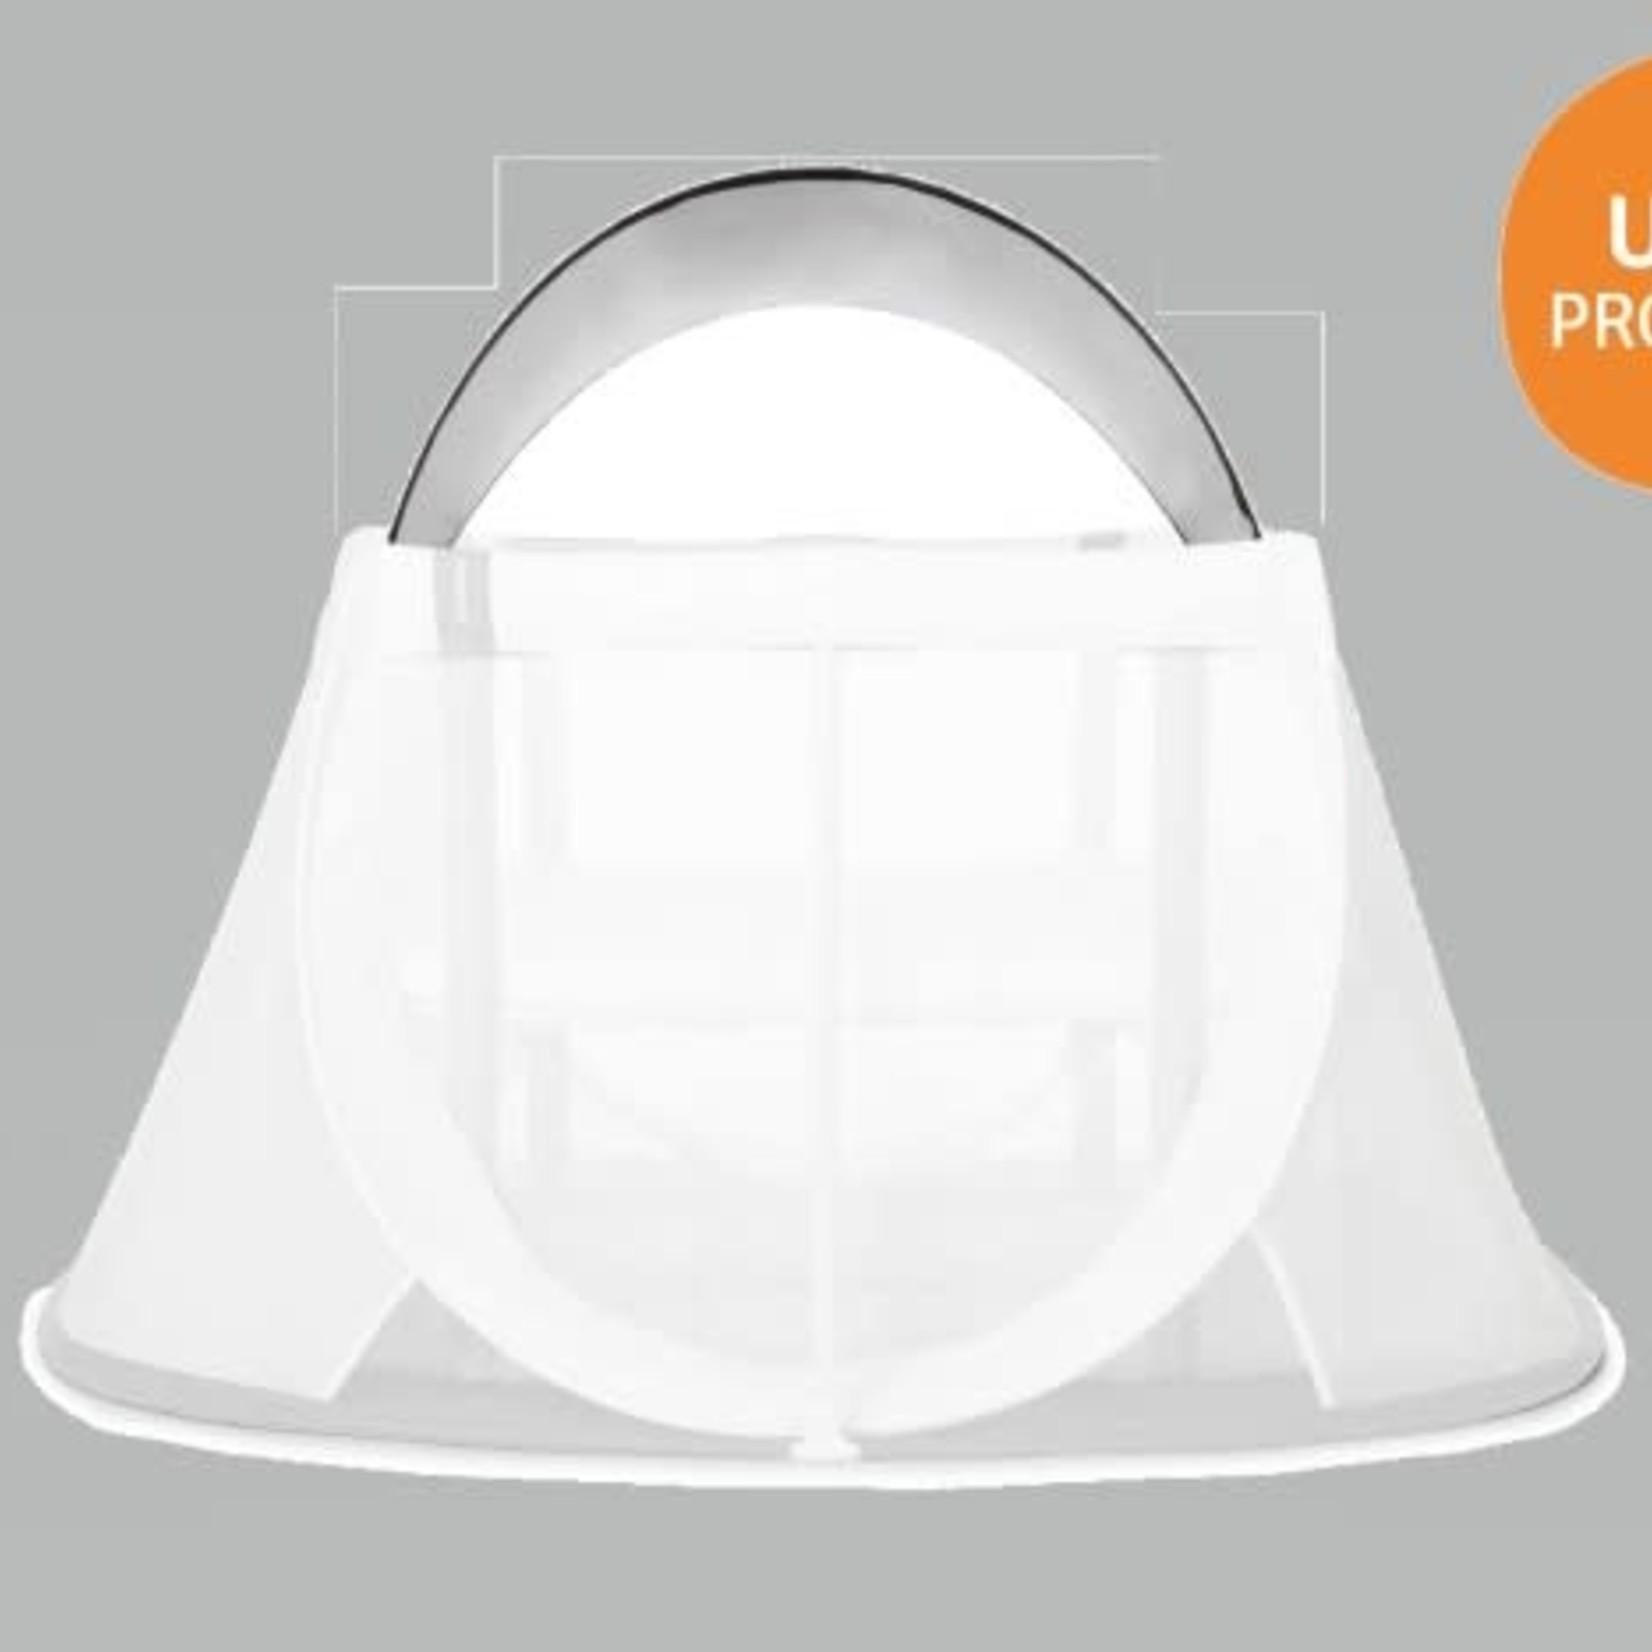 AeroMoov Instant travel cot - Sunshade